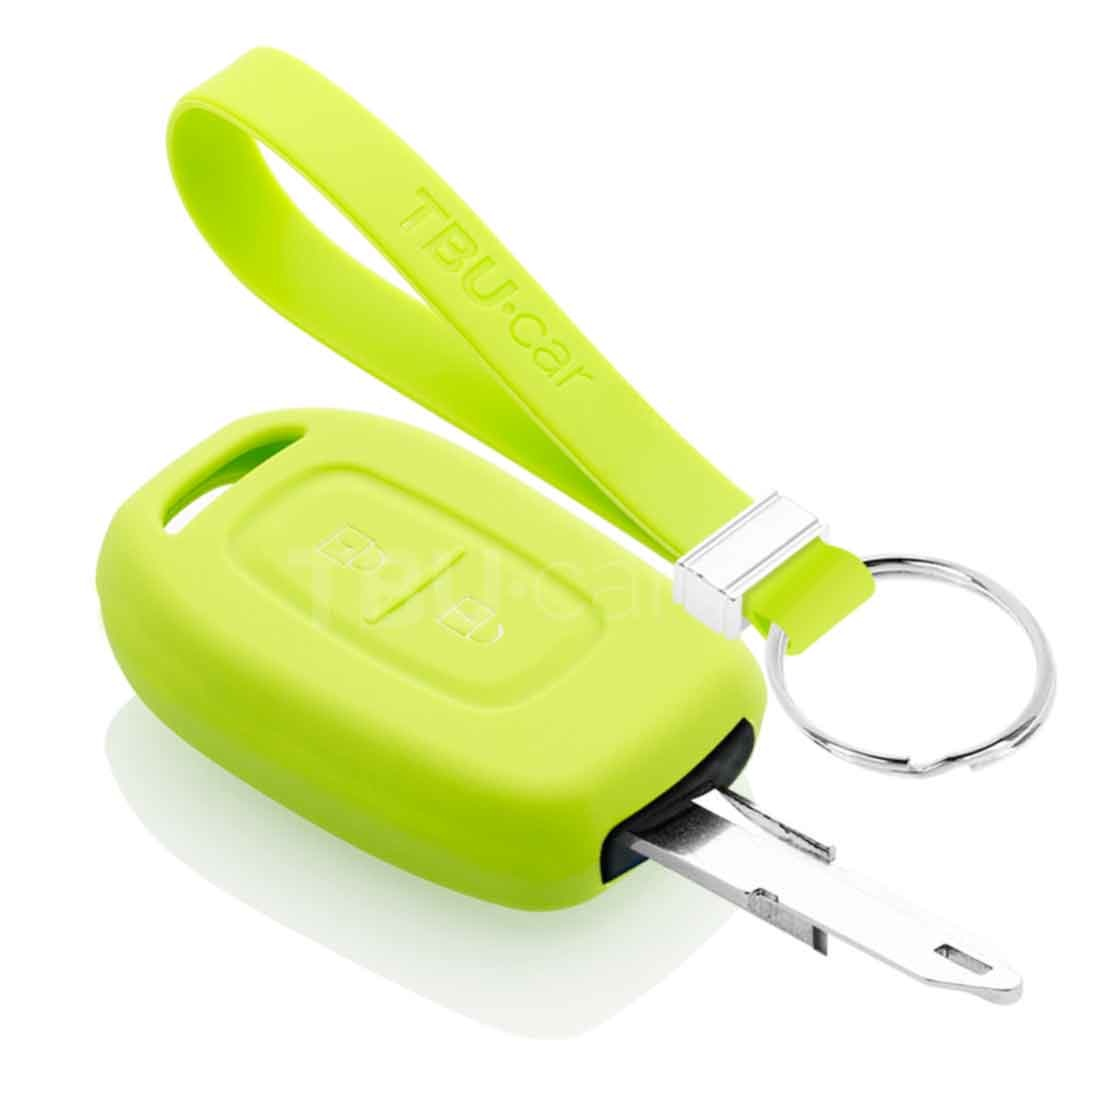 TBU car TBU car Funda Carcasa llave compatible con Dacia - Funda de Silicona - Cover de Llave Coche - Verde lima